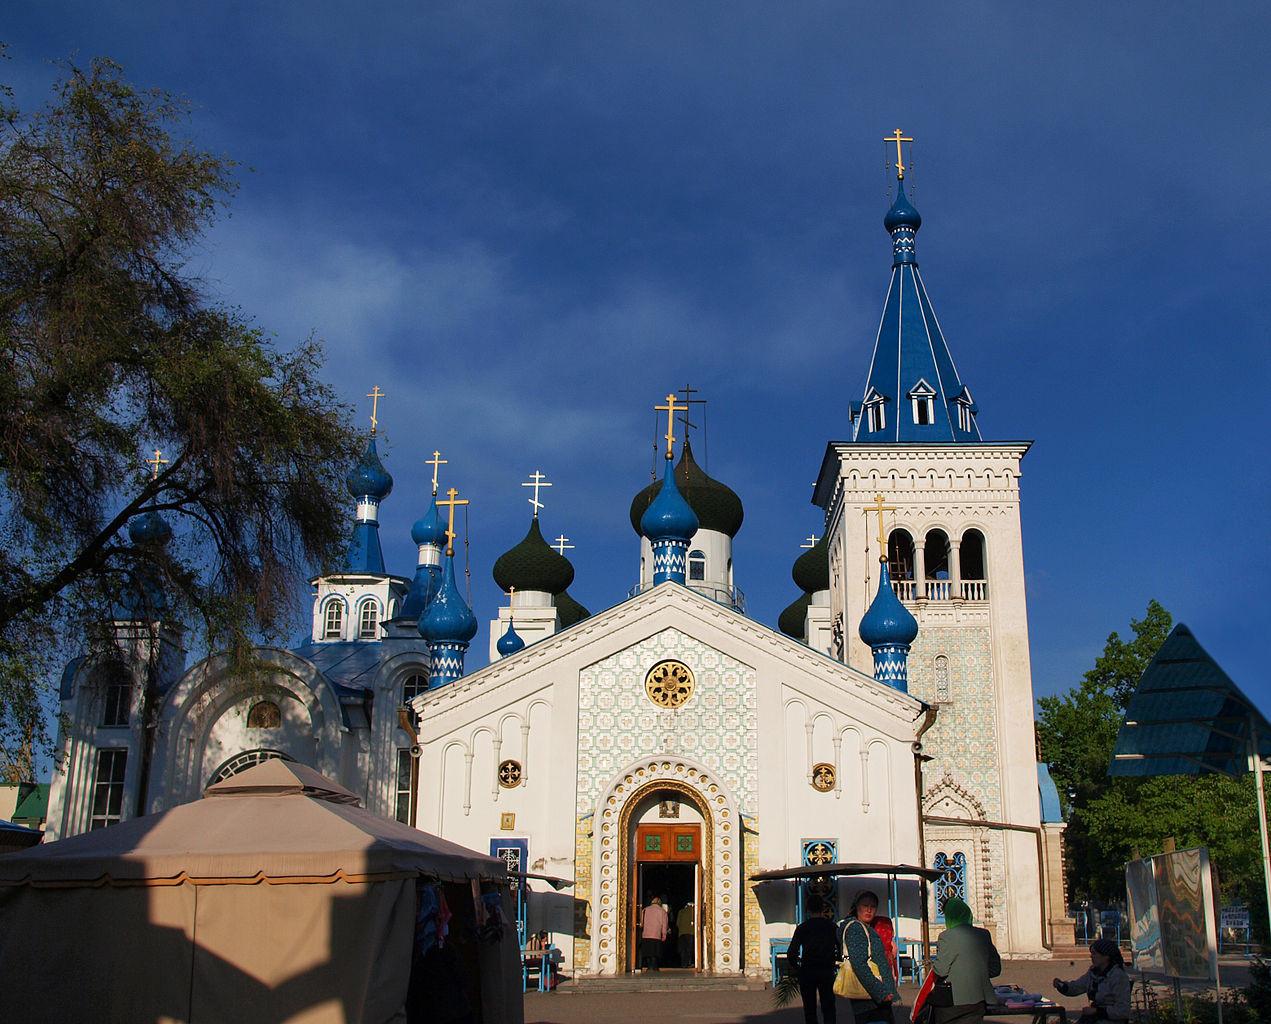 Auferstehungs-Kathedrale in Bischkek, heute Kirgisistan, erbaut 1944 bis 1947